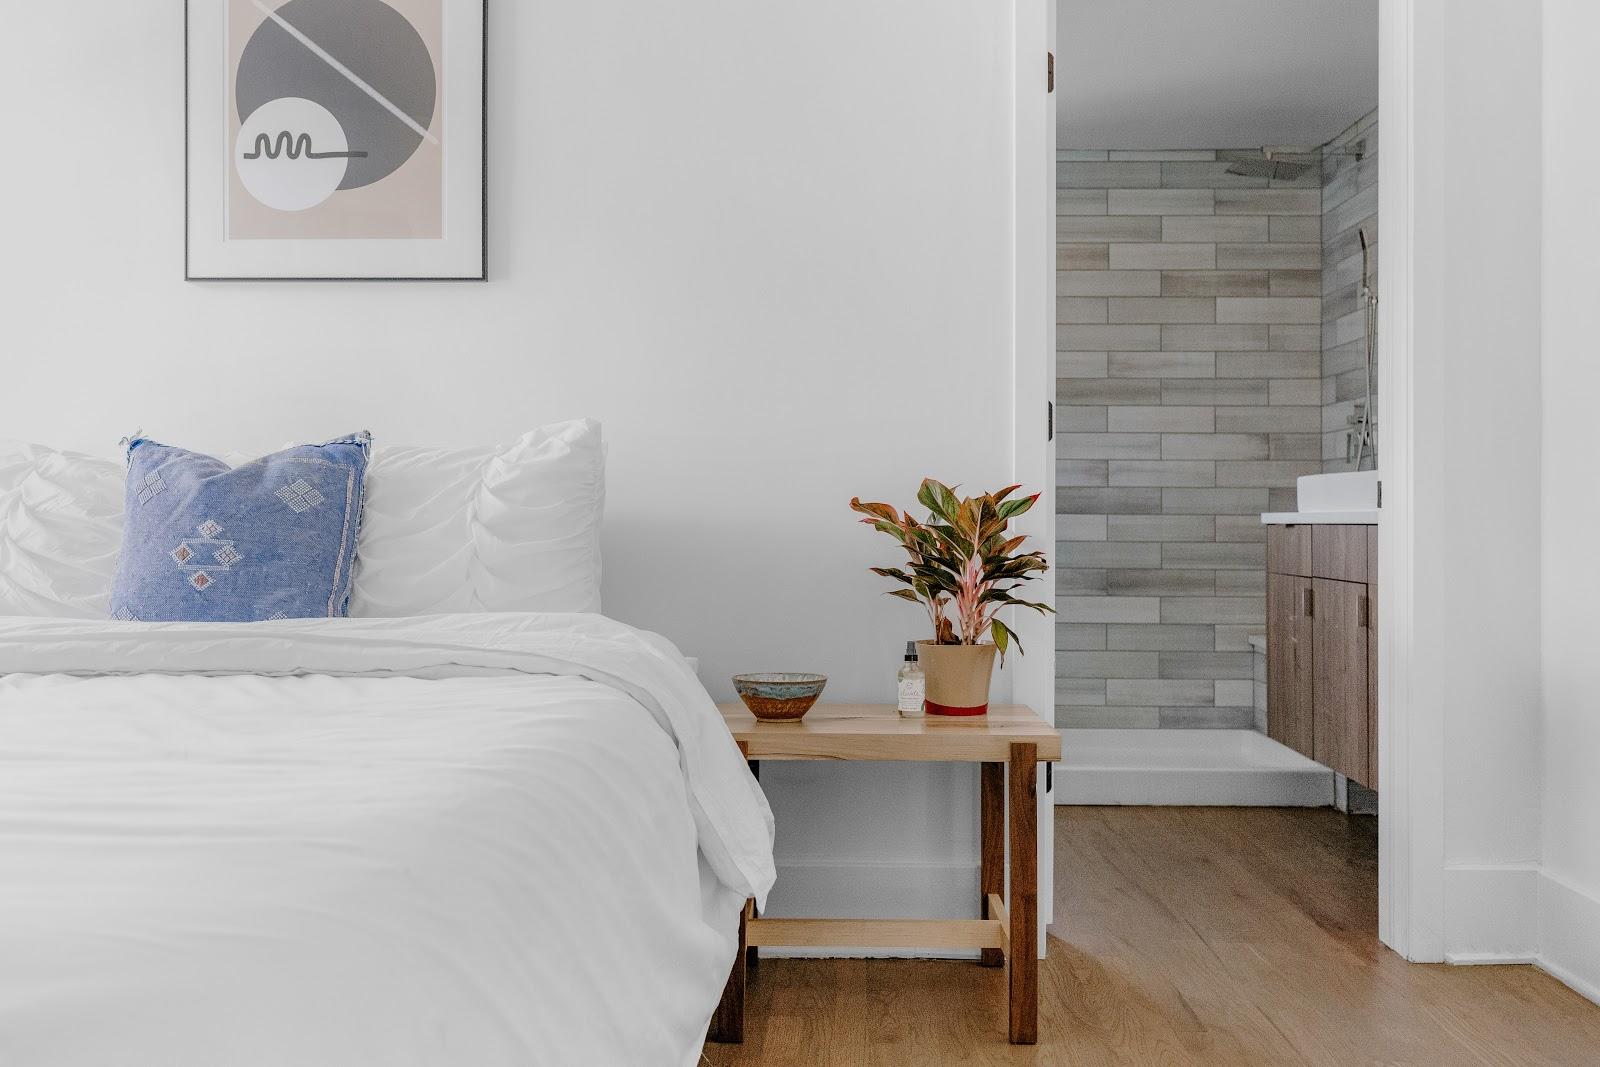 clean bedroom at Tripalink property with brown hardwood floors